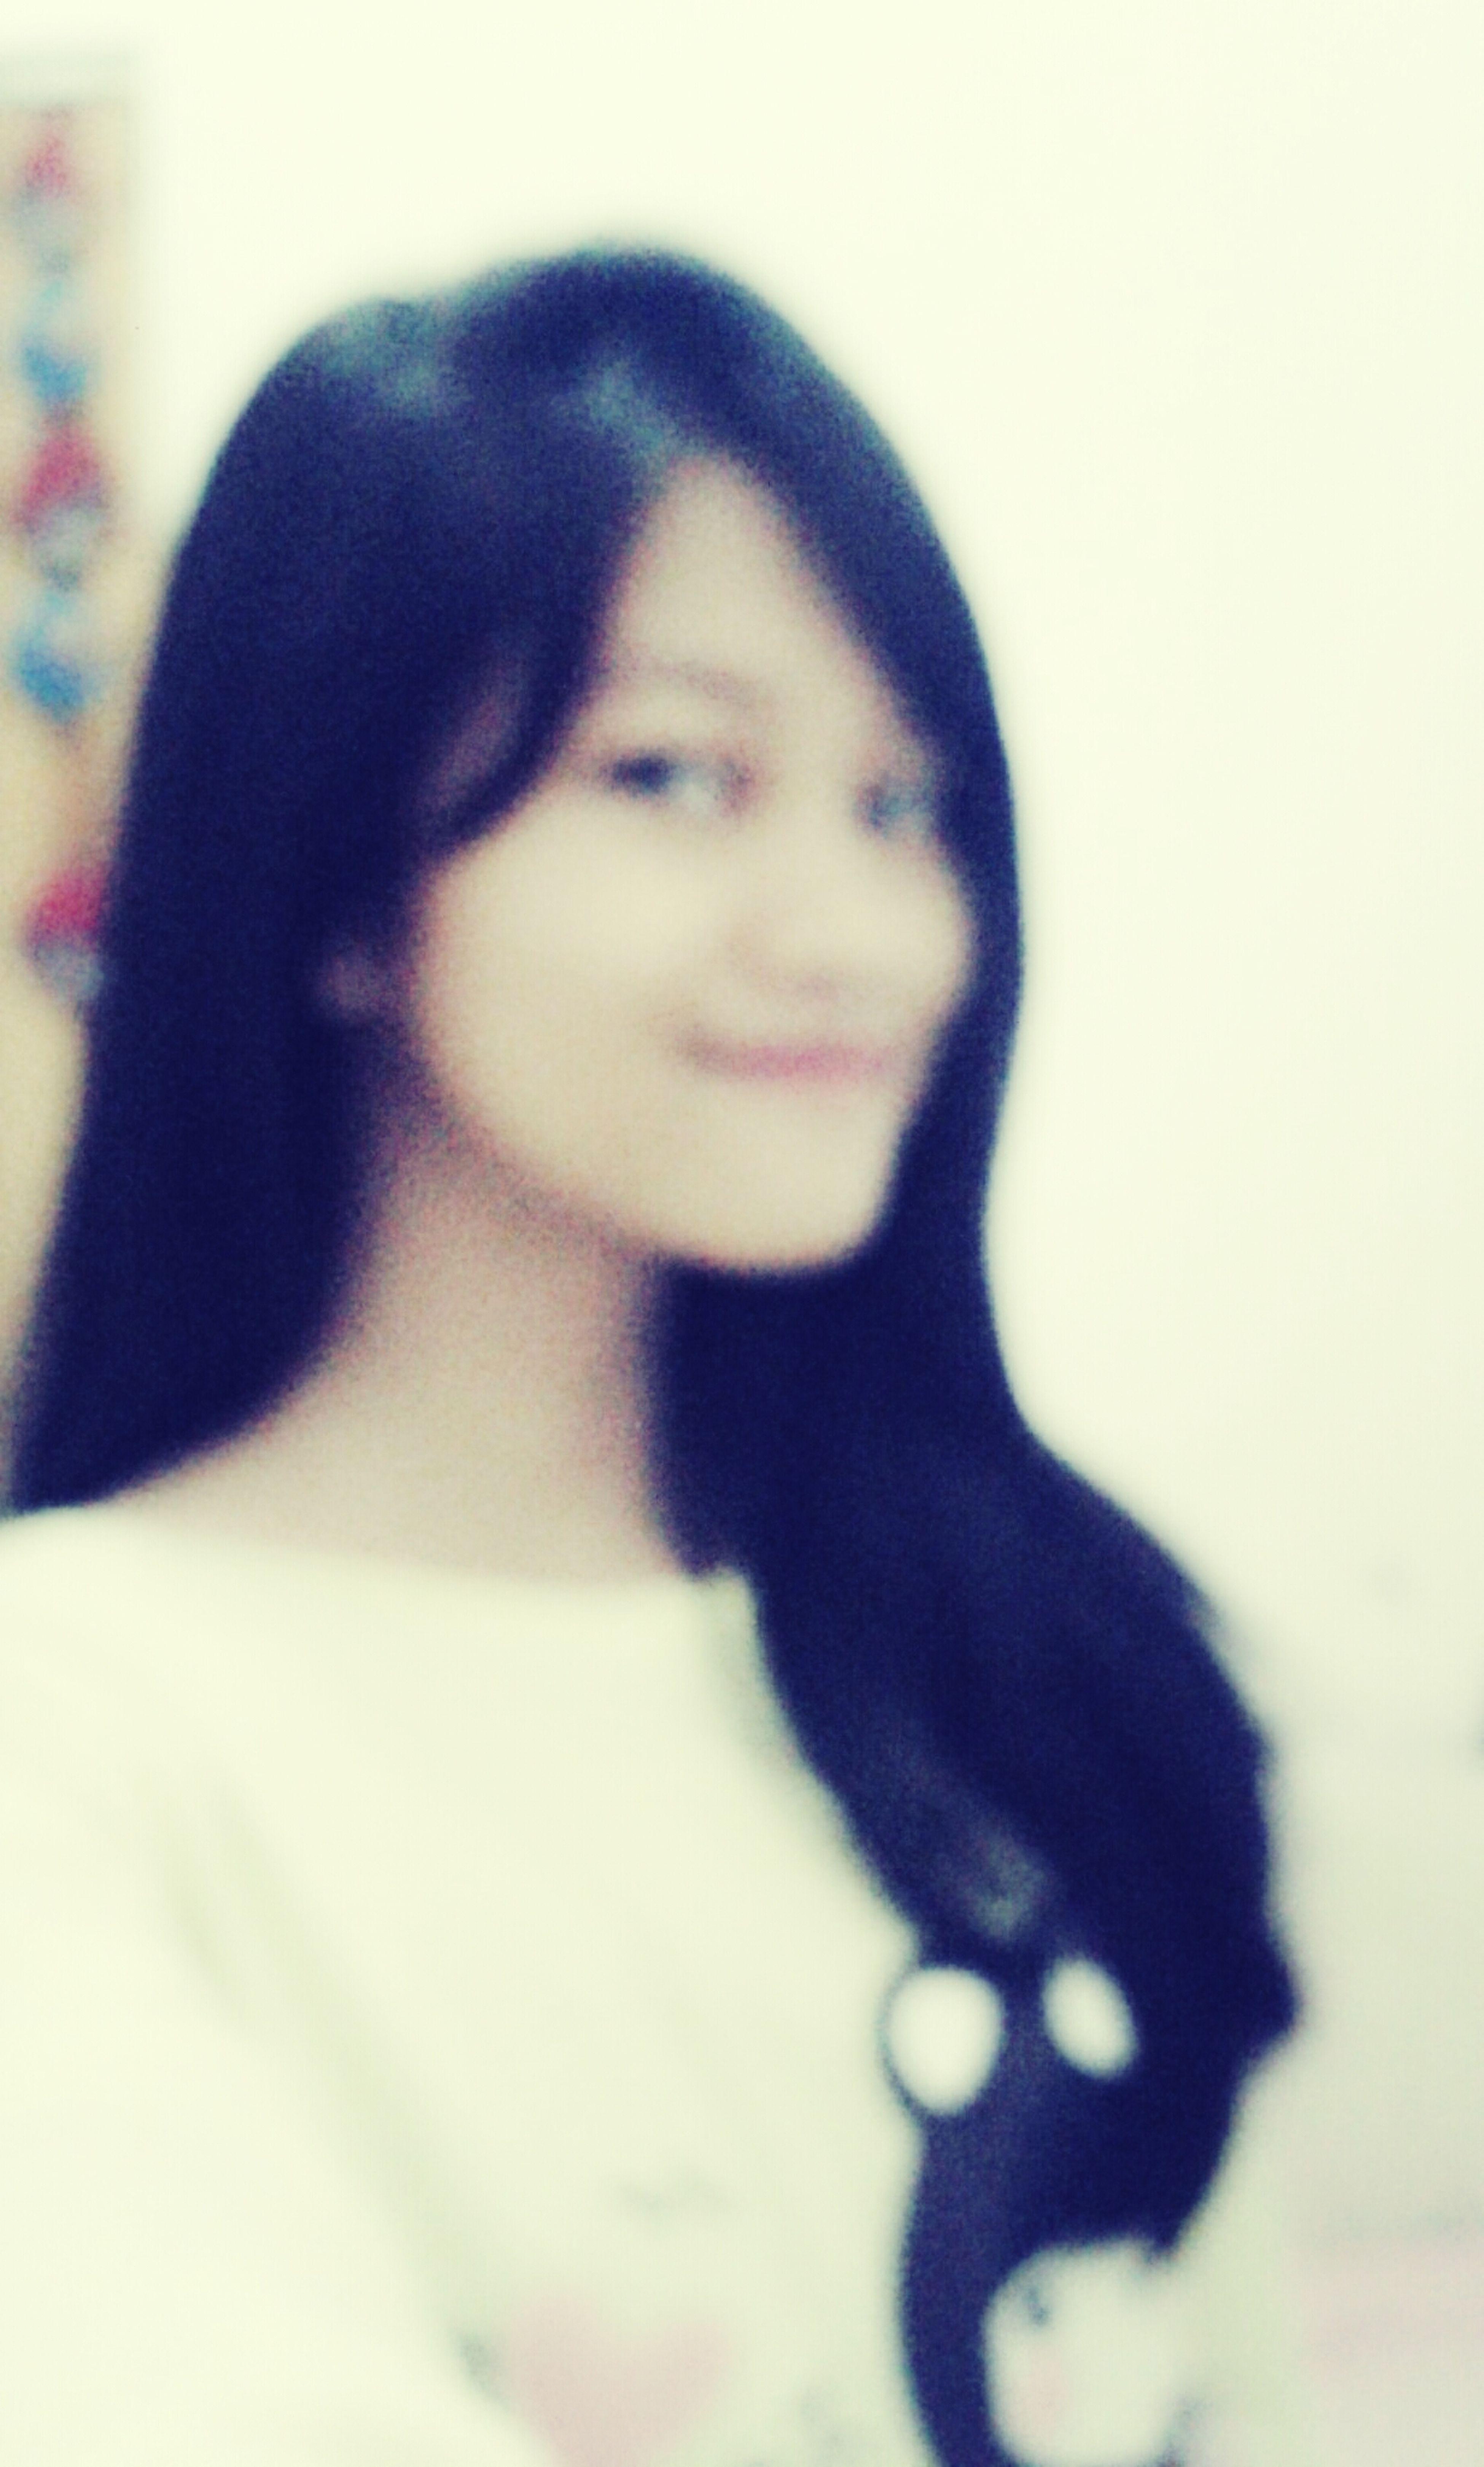 Blur HappySunday ツ ThatsMe Young